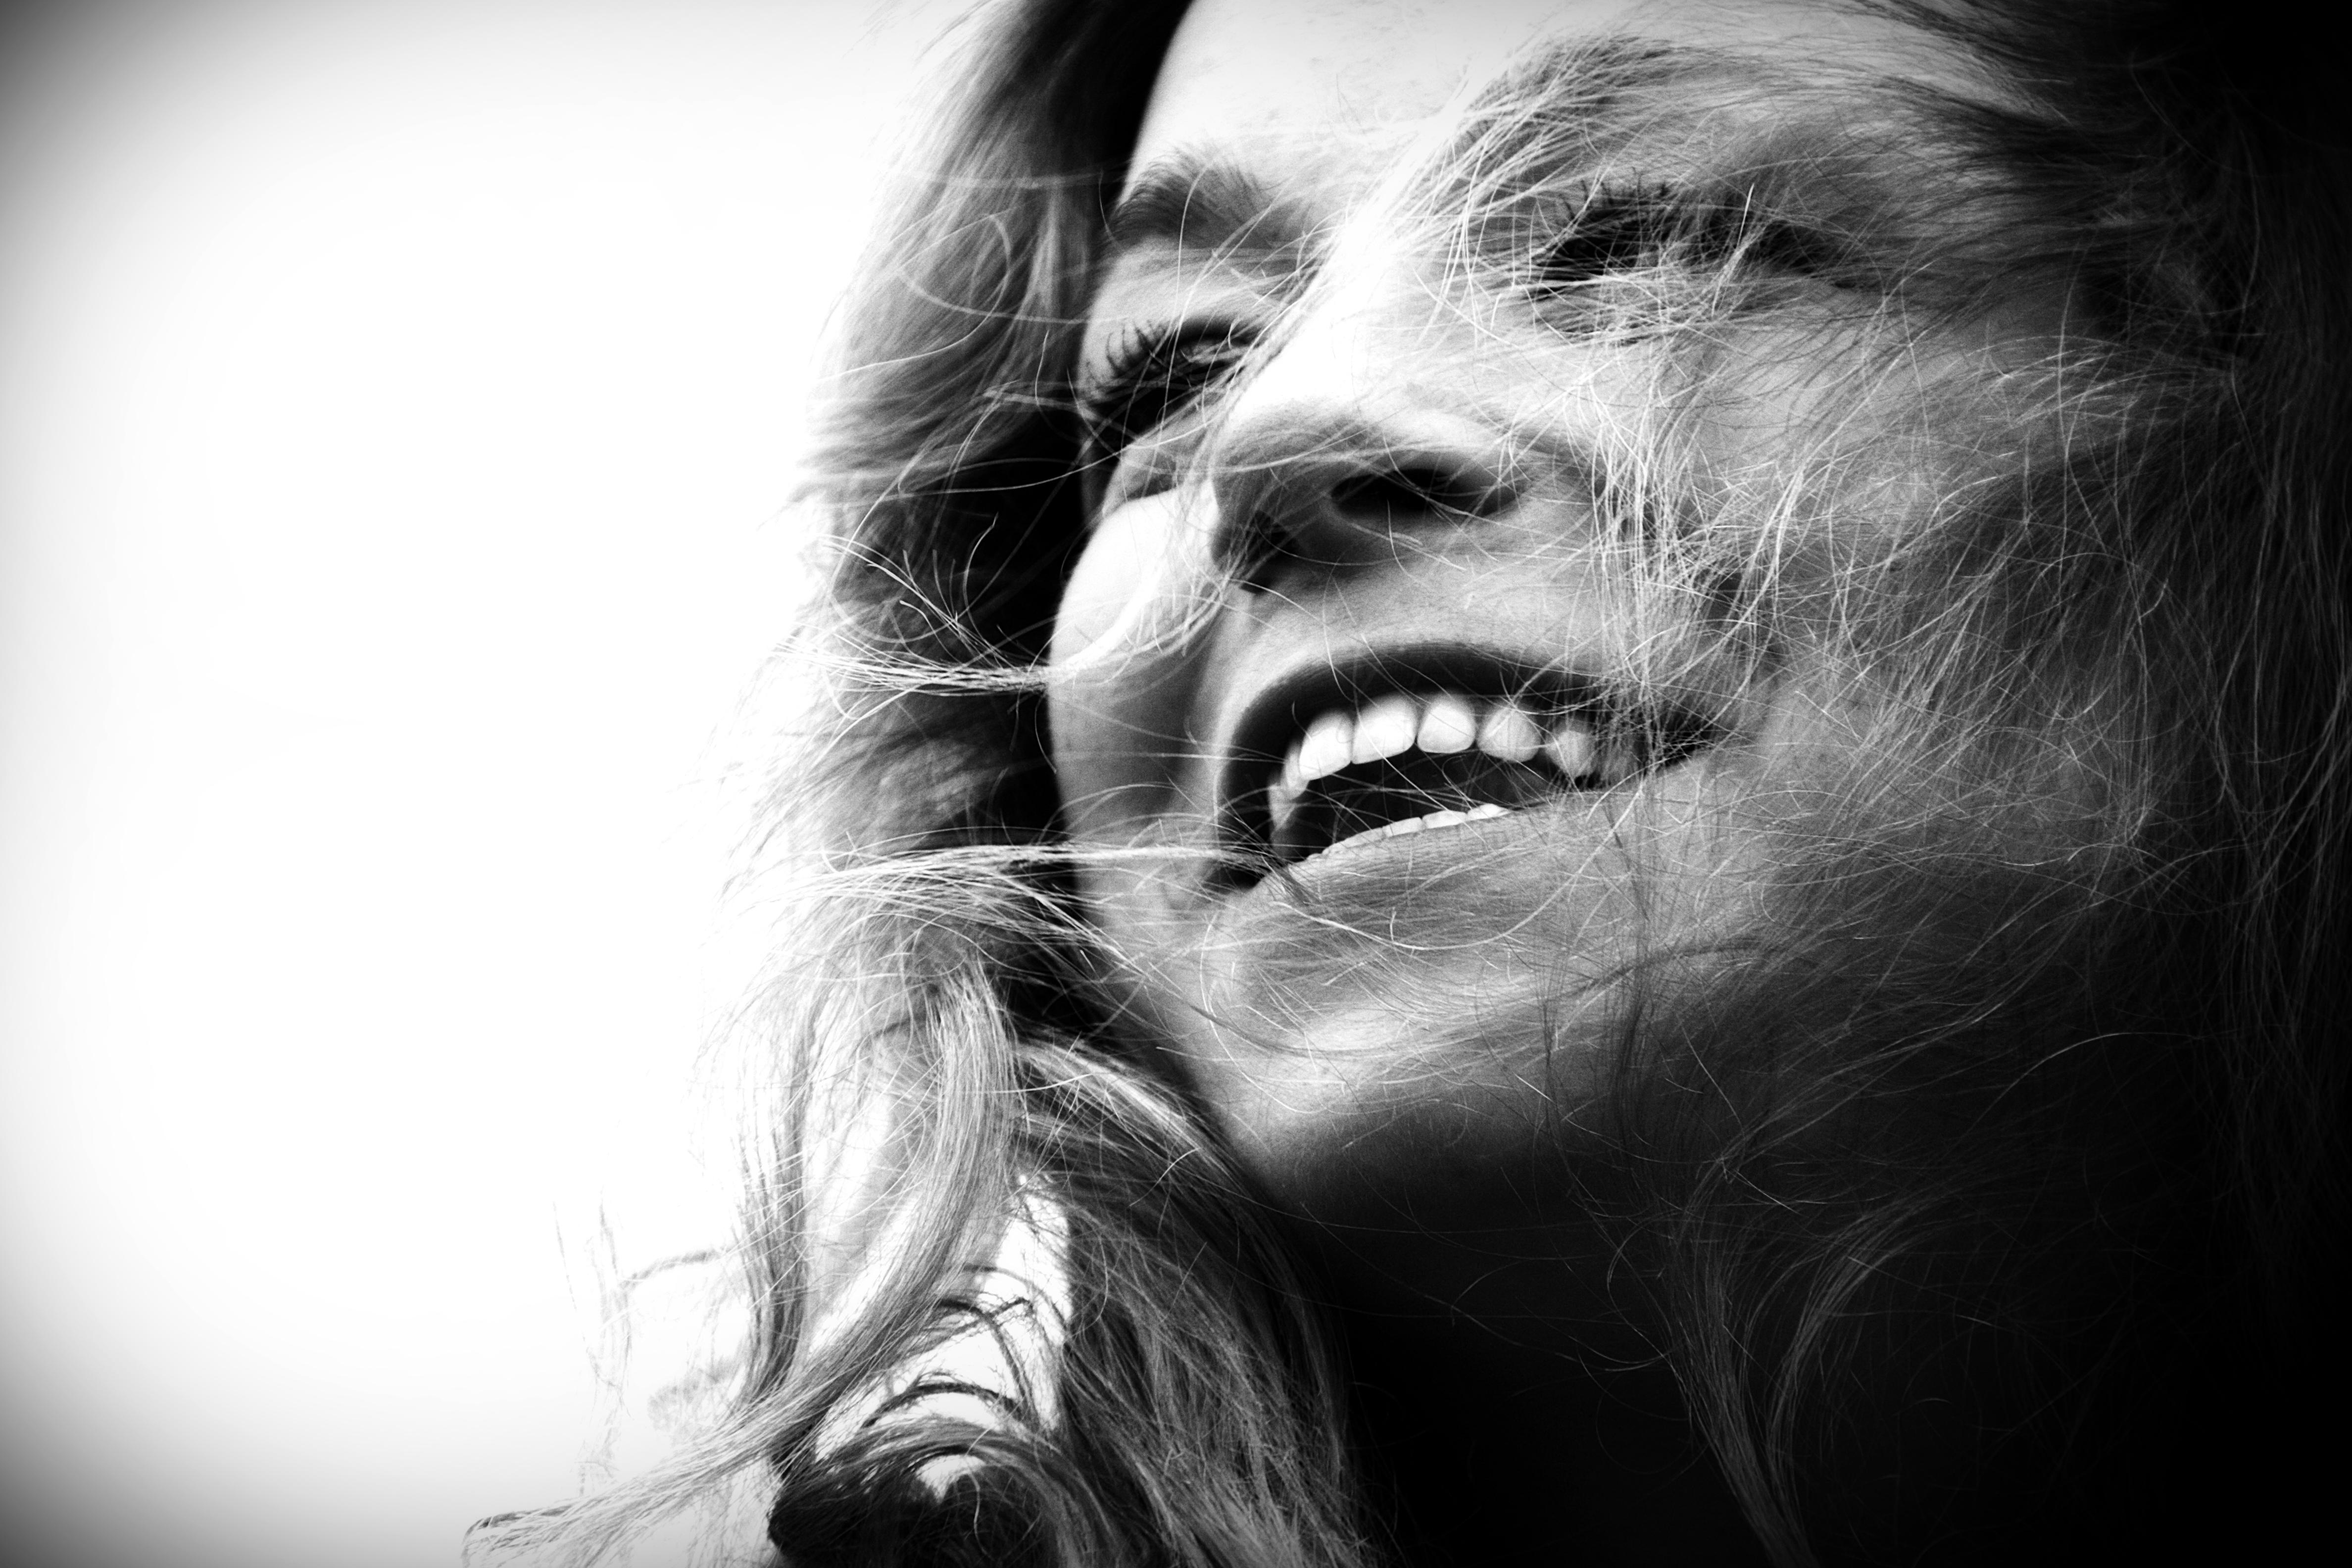 Caterina-pogorzelski-Megabambi-Blogger-Moderatorin-Tipps